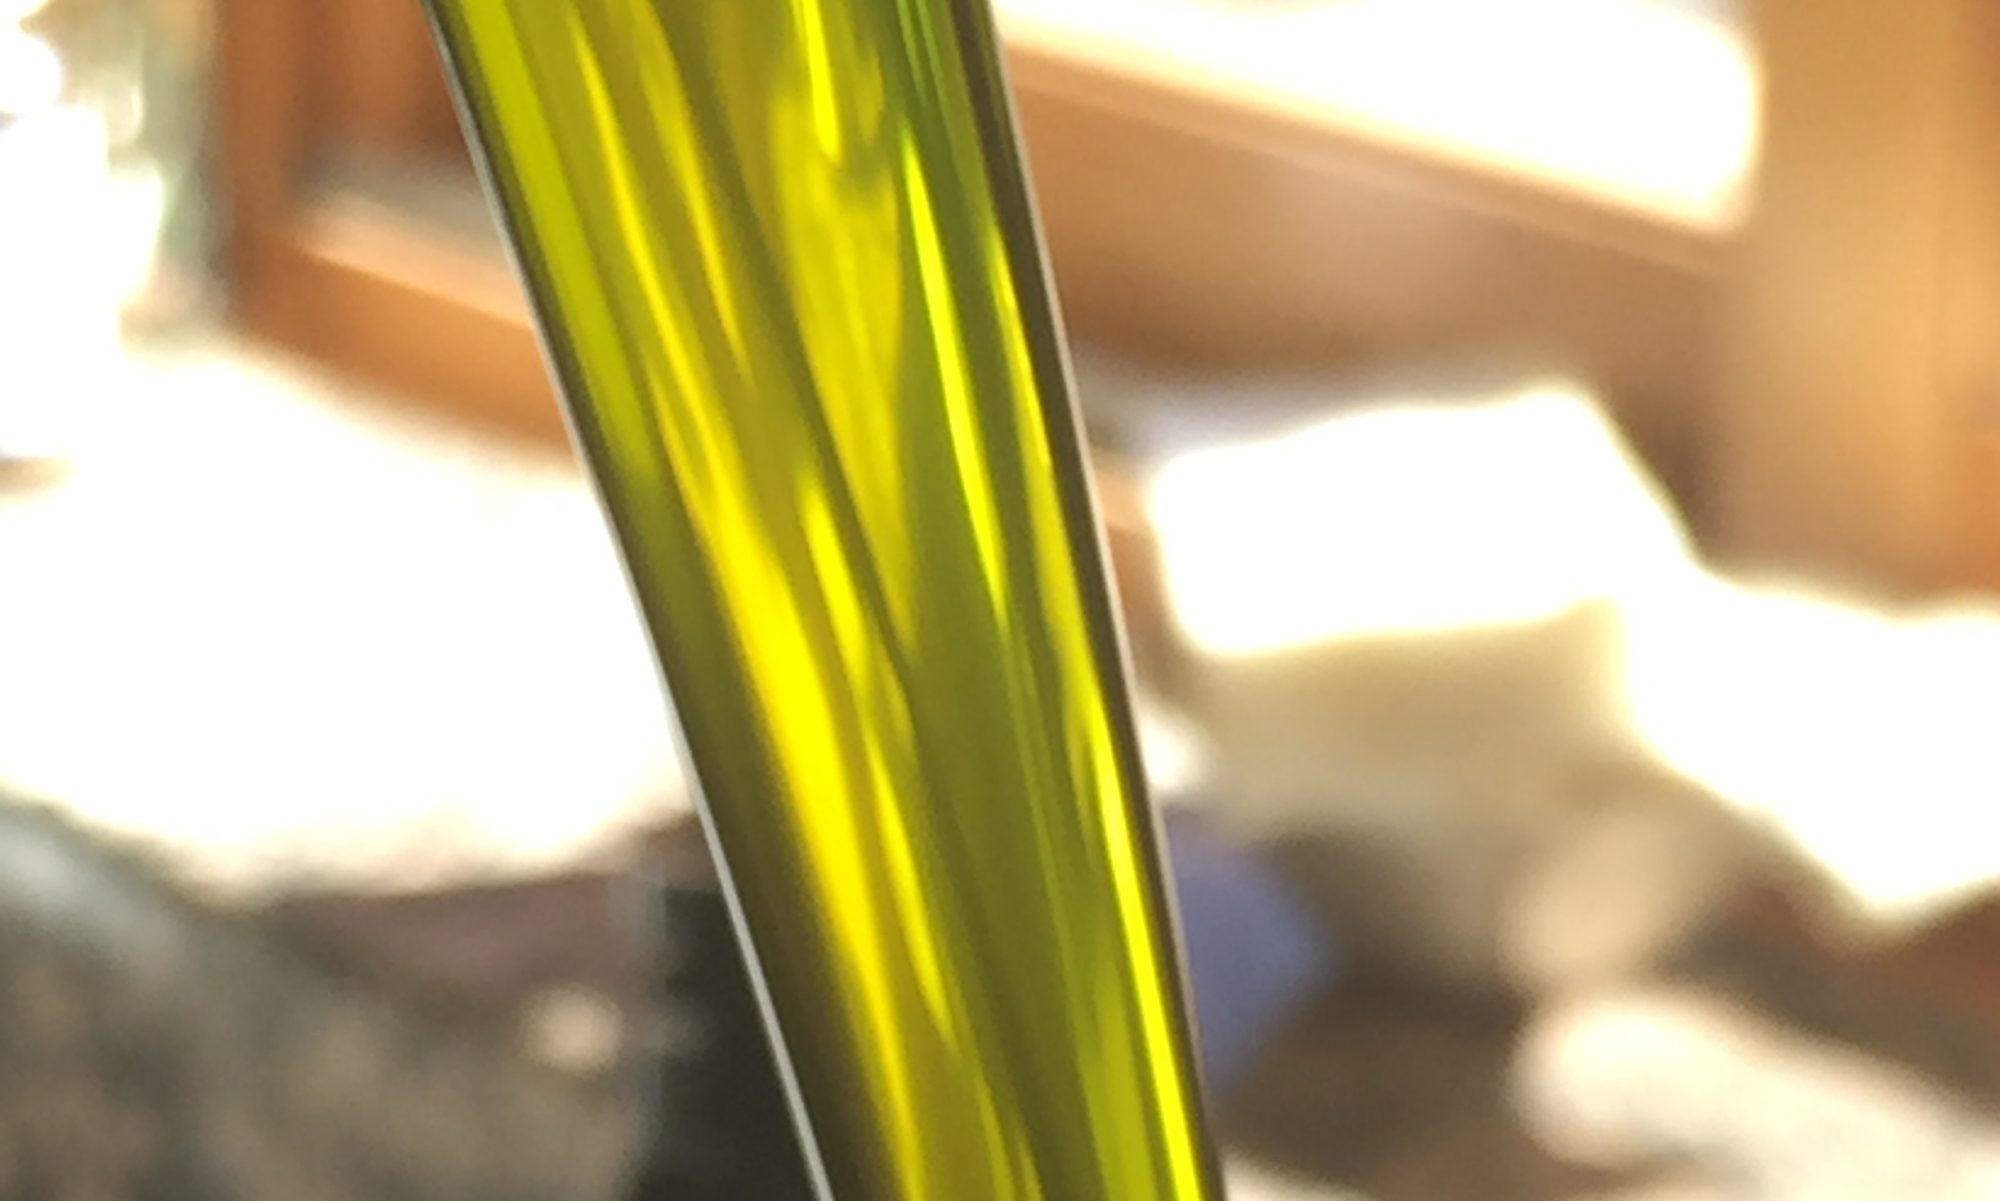 Partridge Family Olive Oil